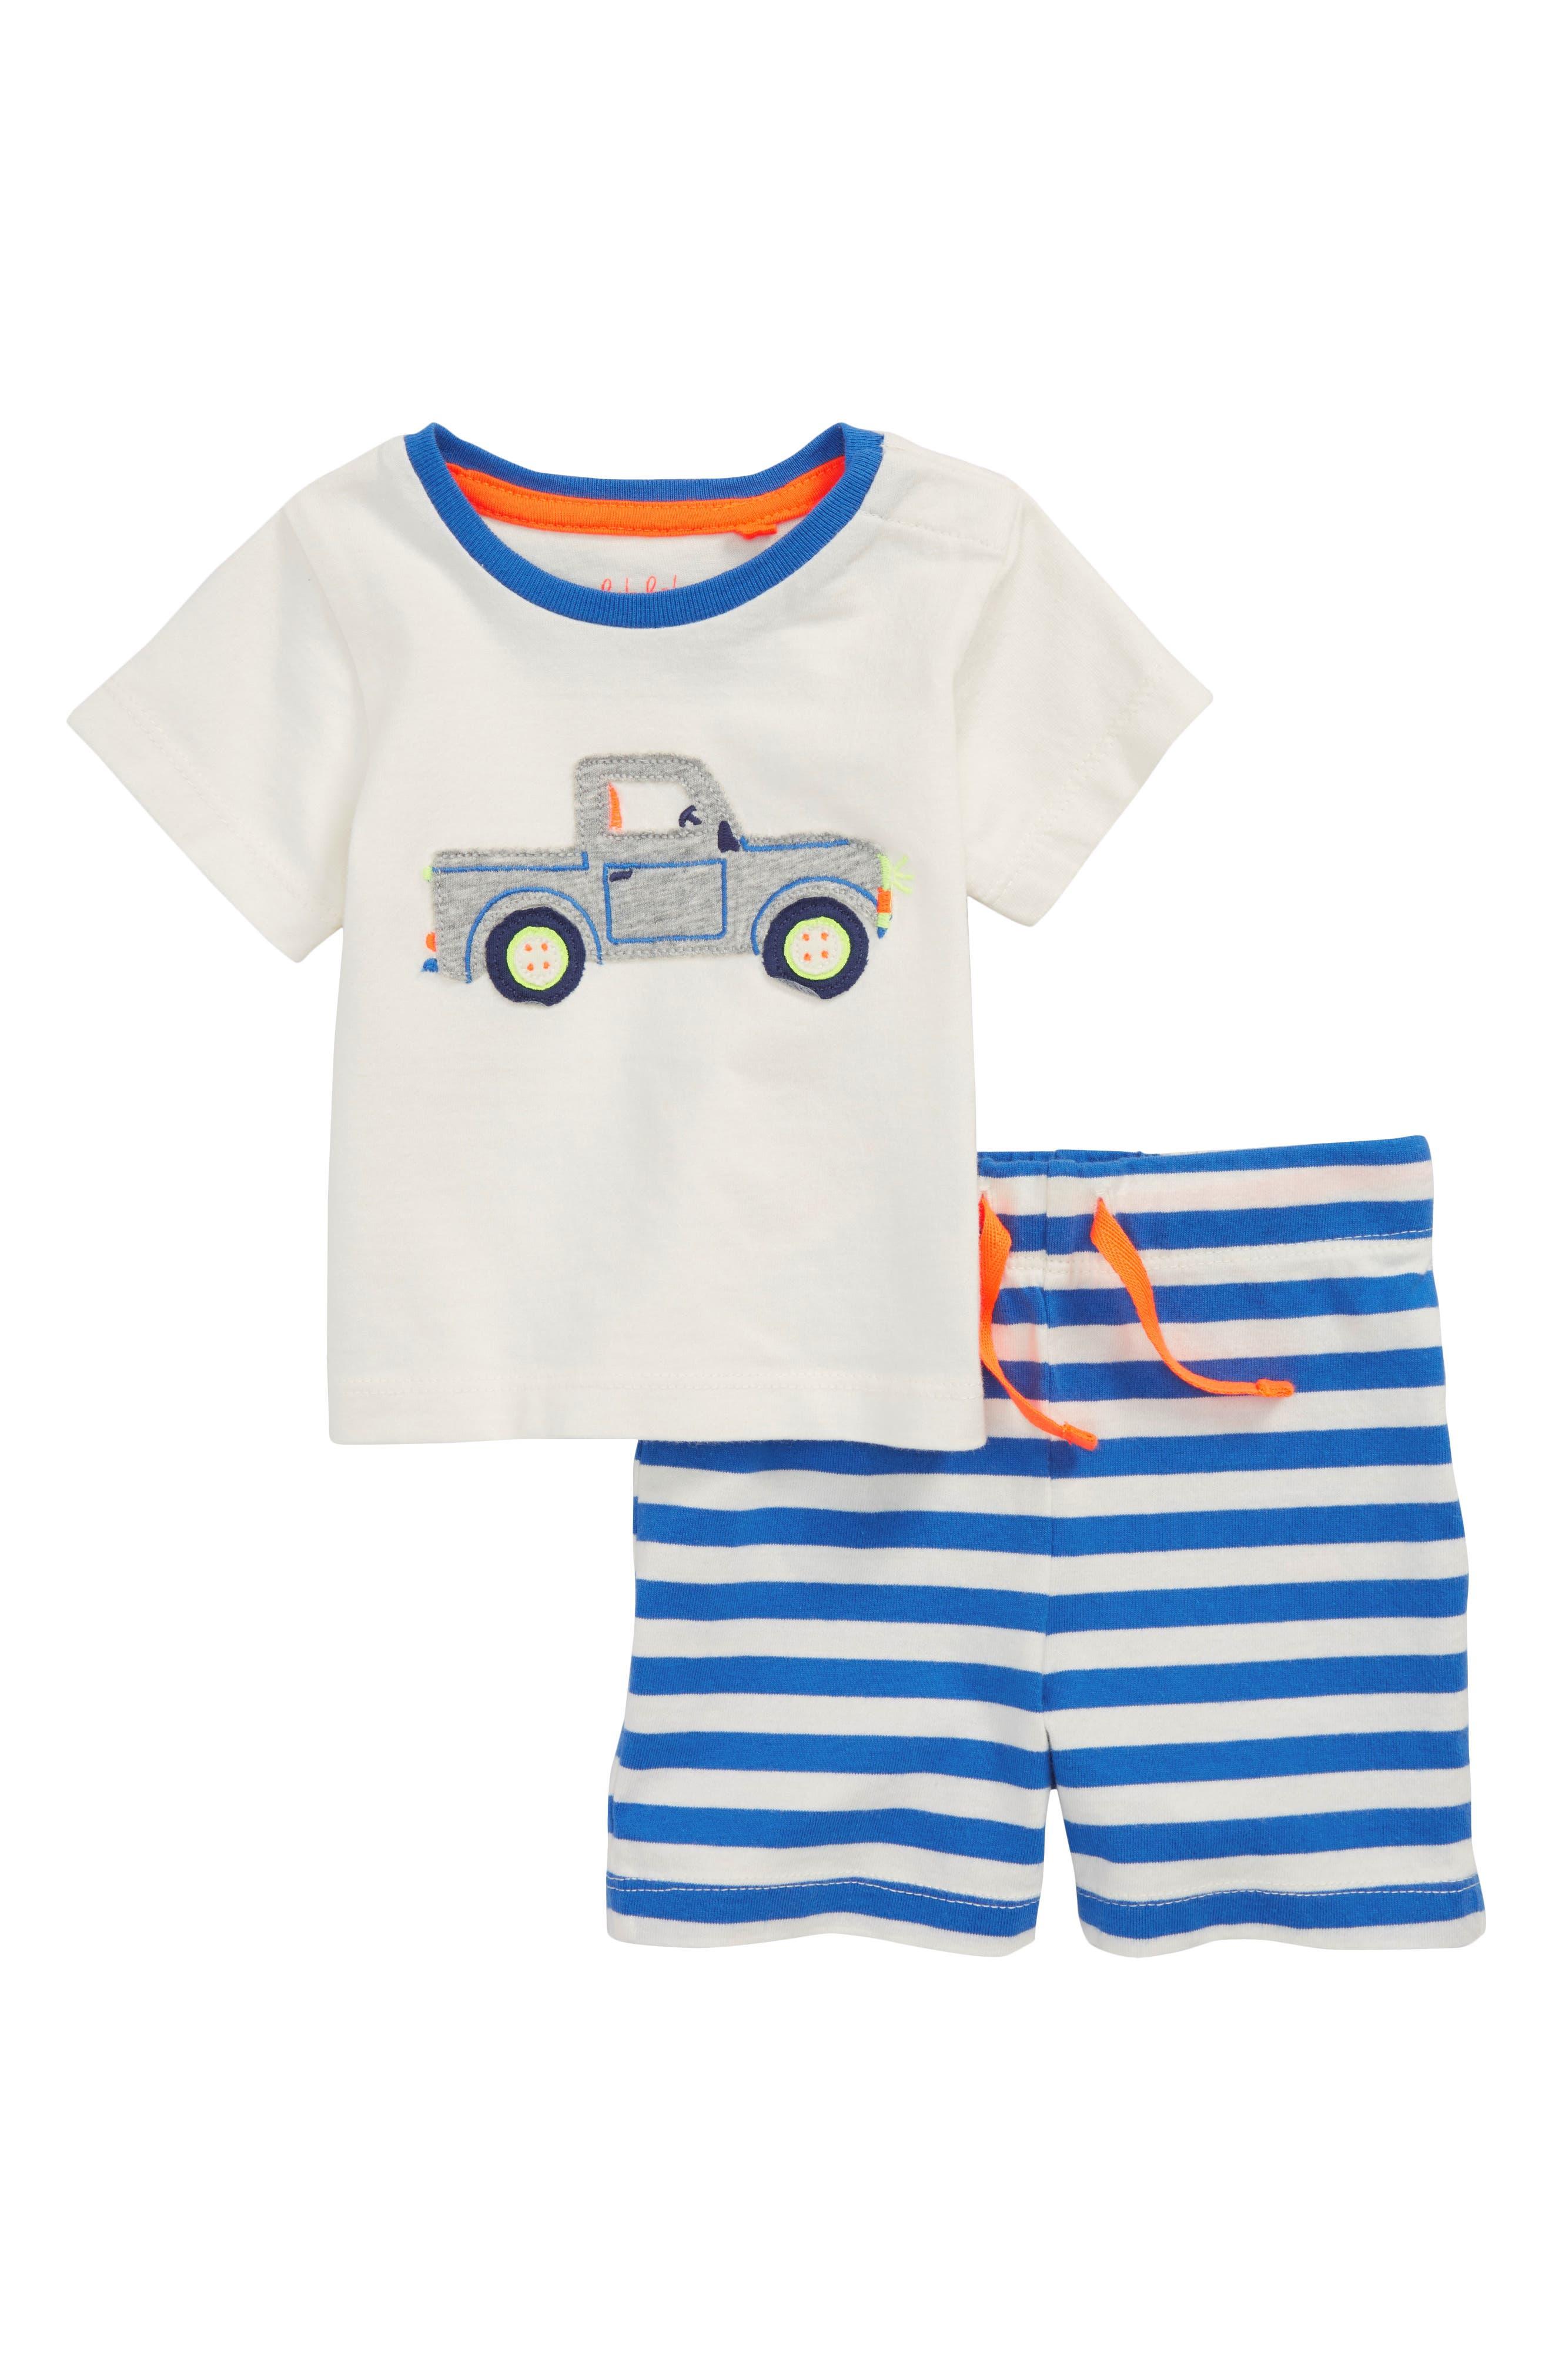 Fun Truck Appliqué T-Shirt & Shorts Set,                         Main,                         color, 904